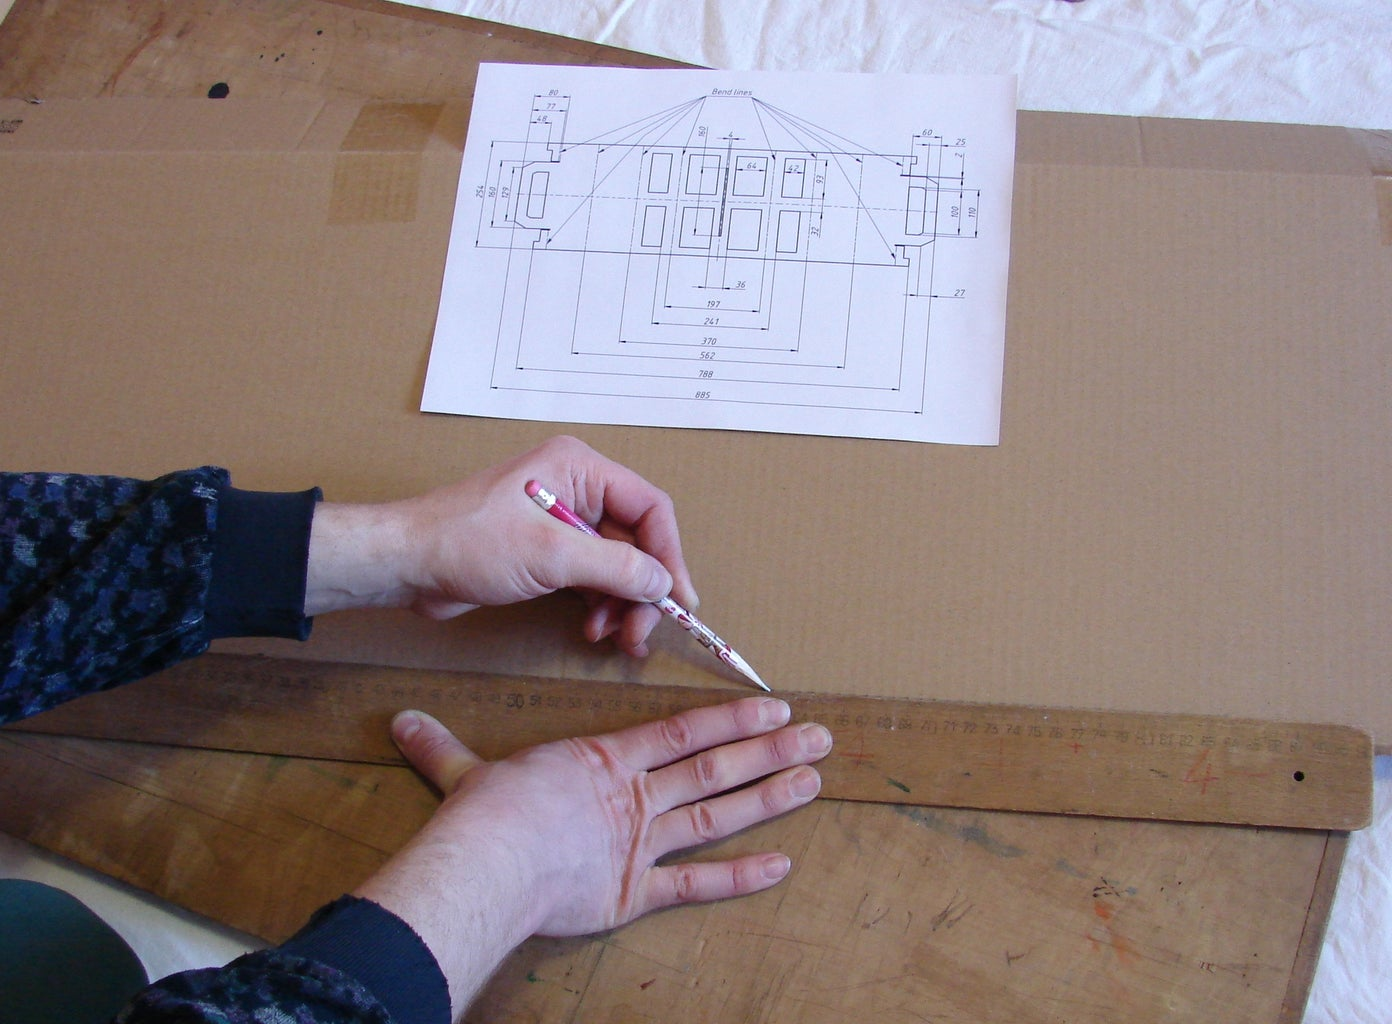 Transferring Drawing to a Cardboard